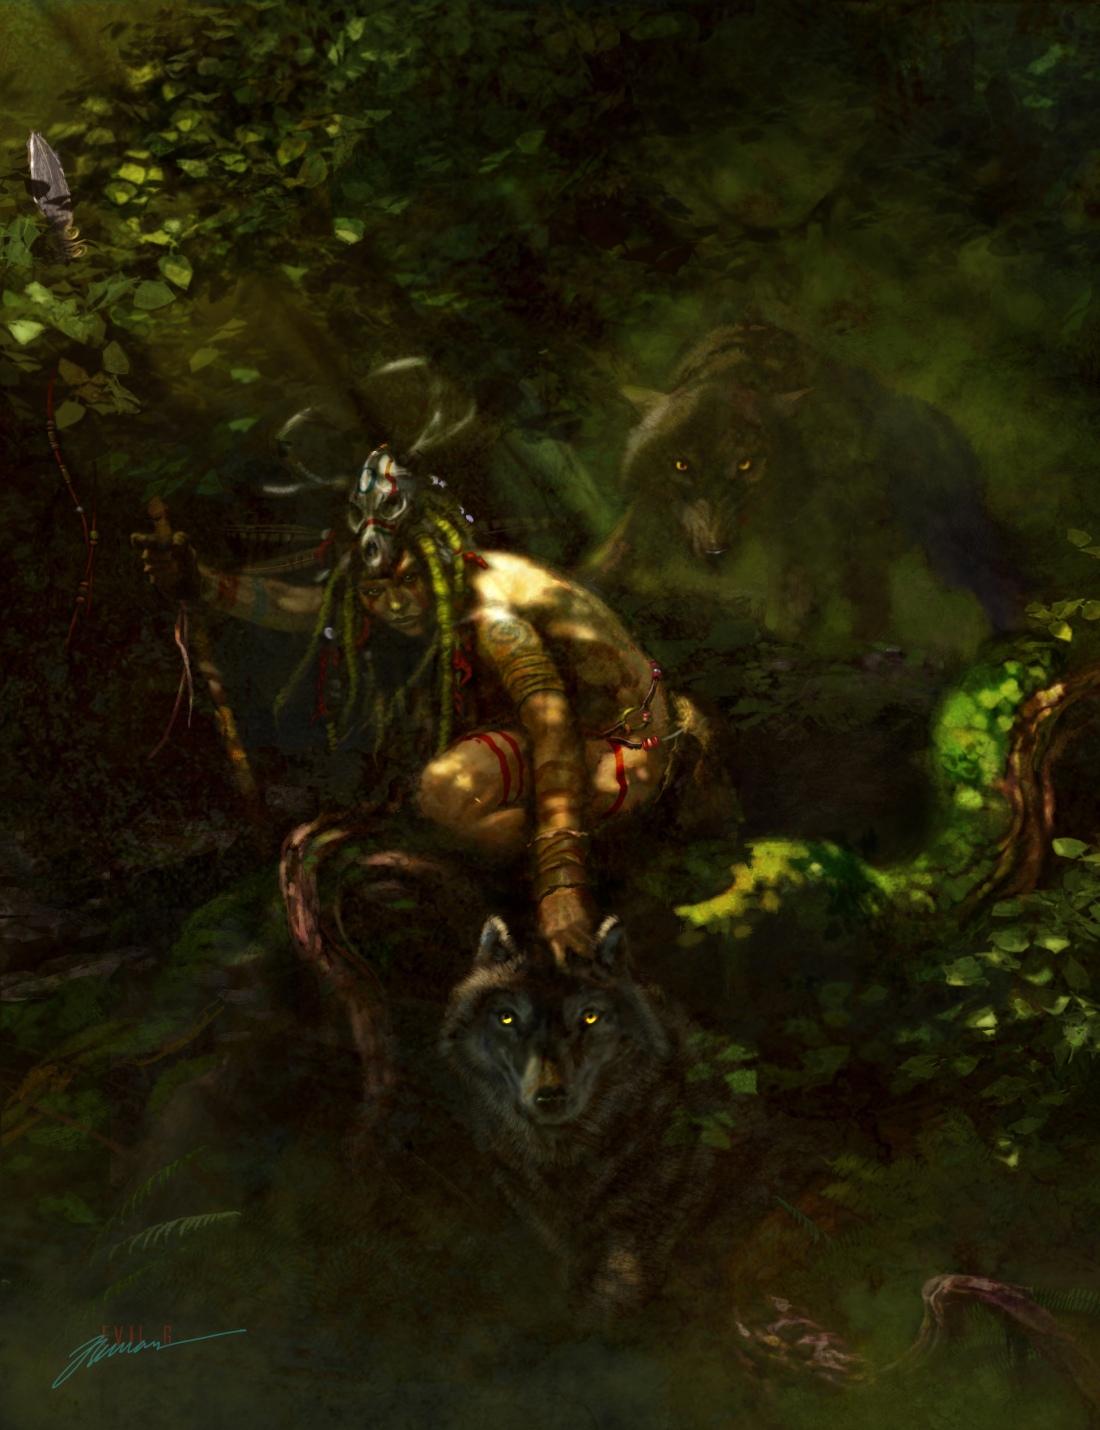 Gary_Freeman_illustration_Spirits_in_the Forest_Mist